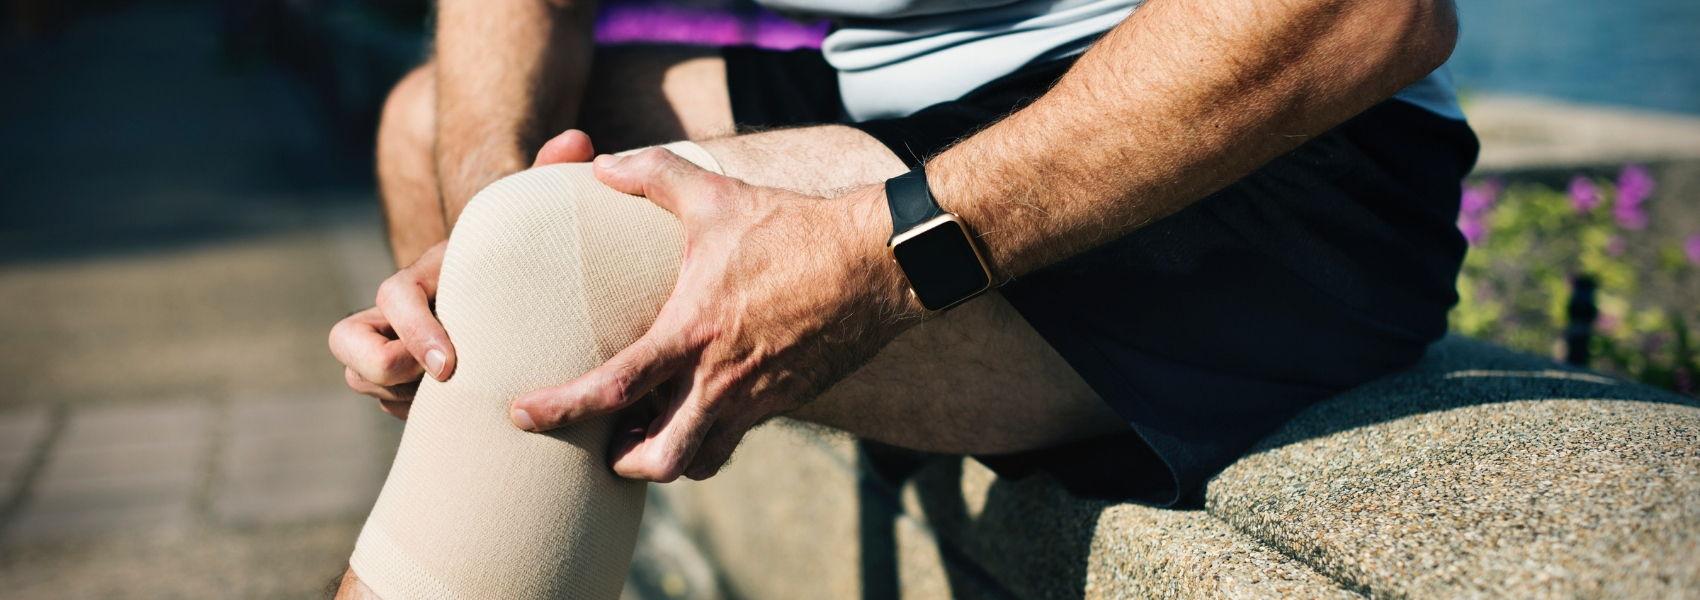 minimizar a osteoartrite do joelho